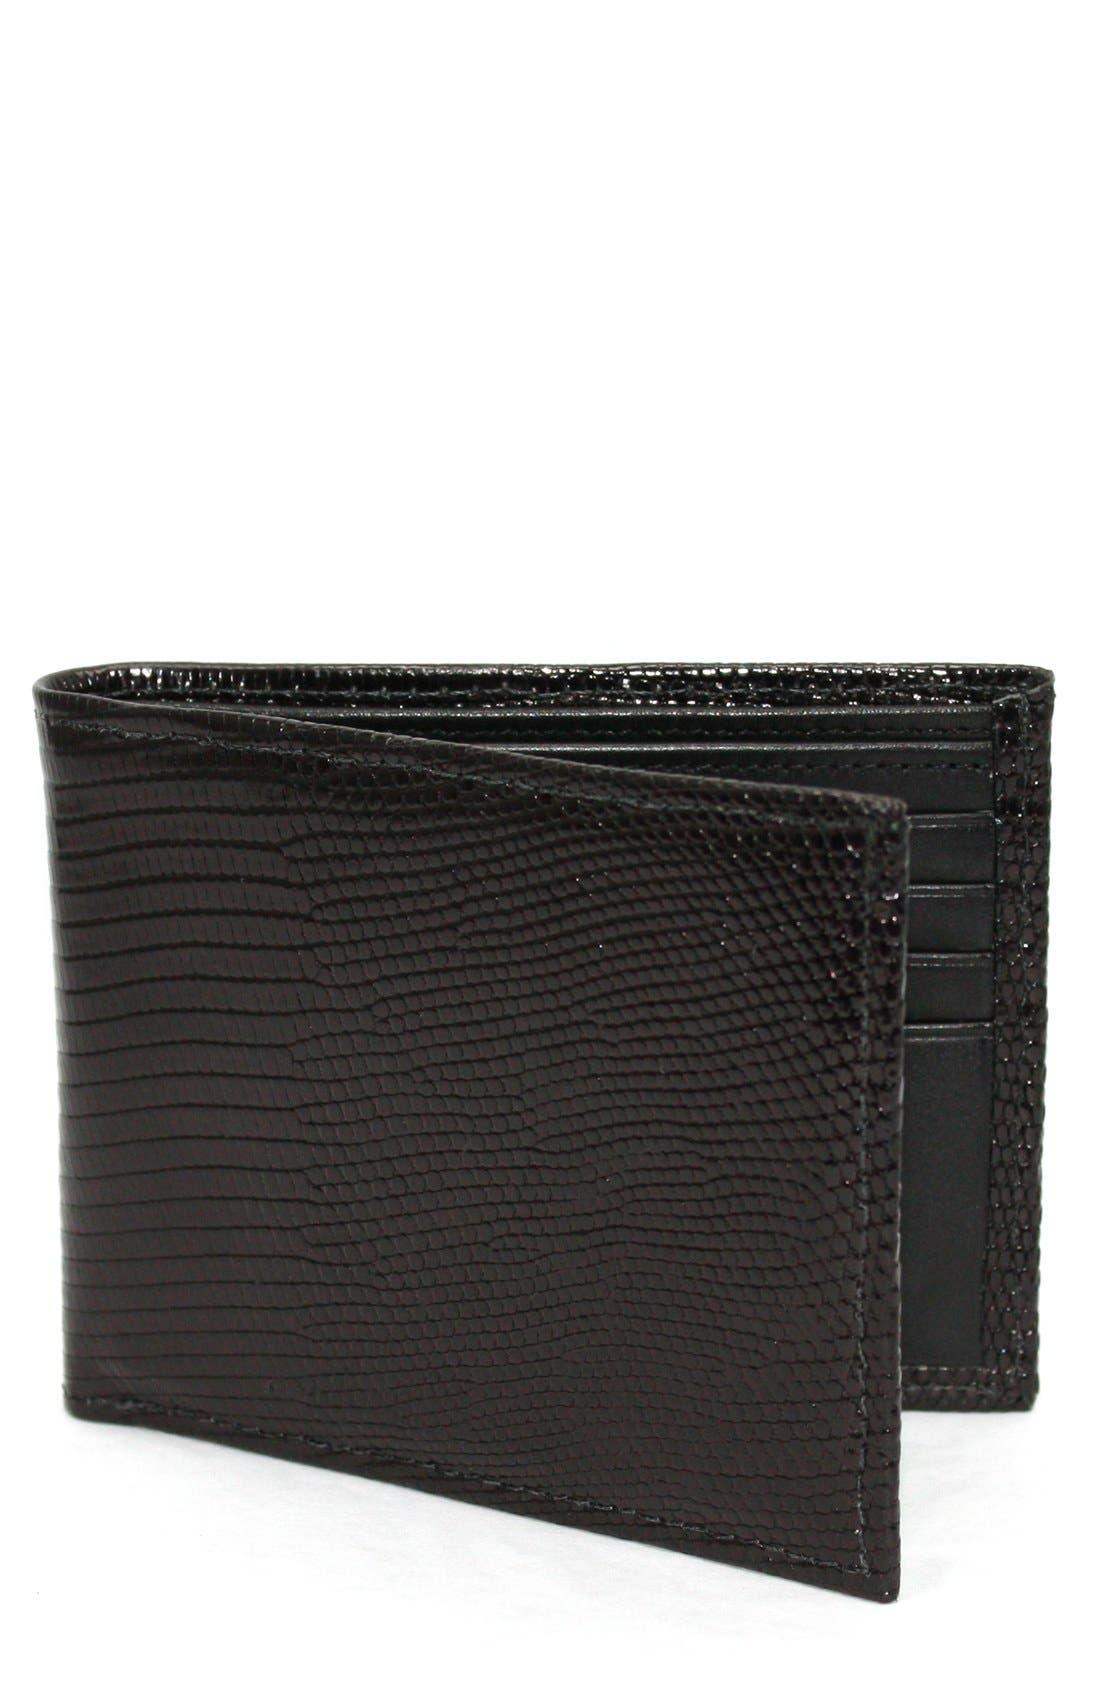 Main Image - Torino Belts Genuine Lizard Wallet